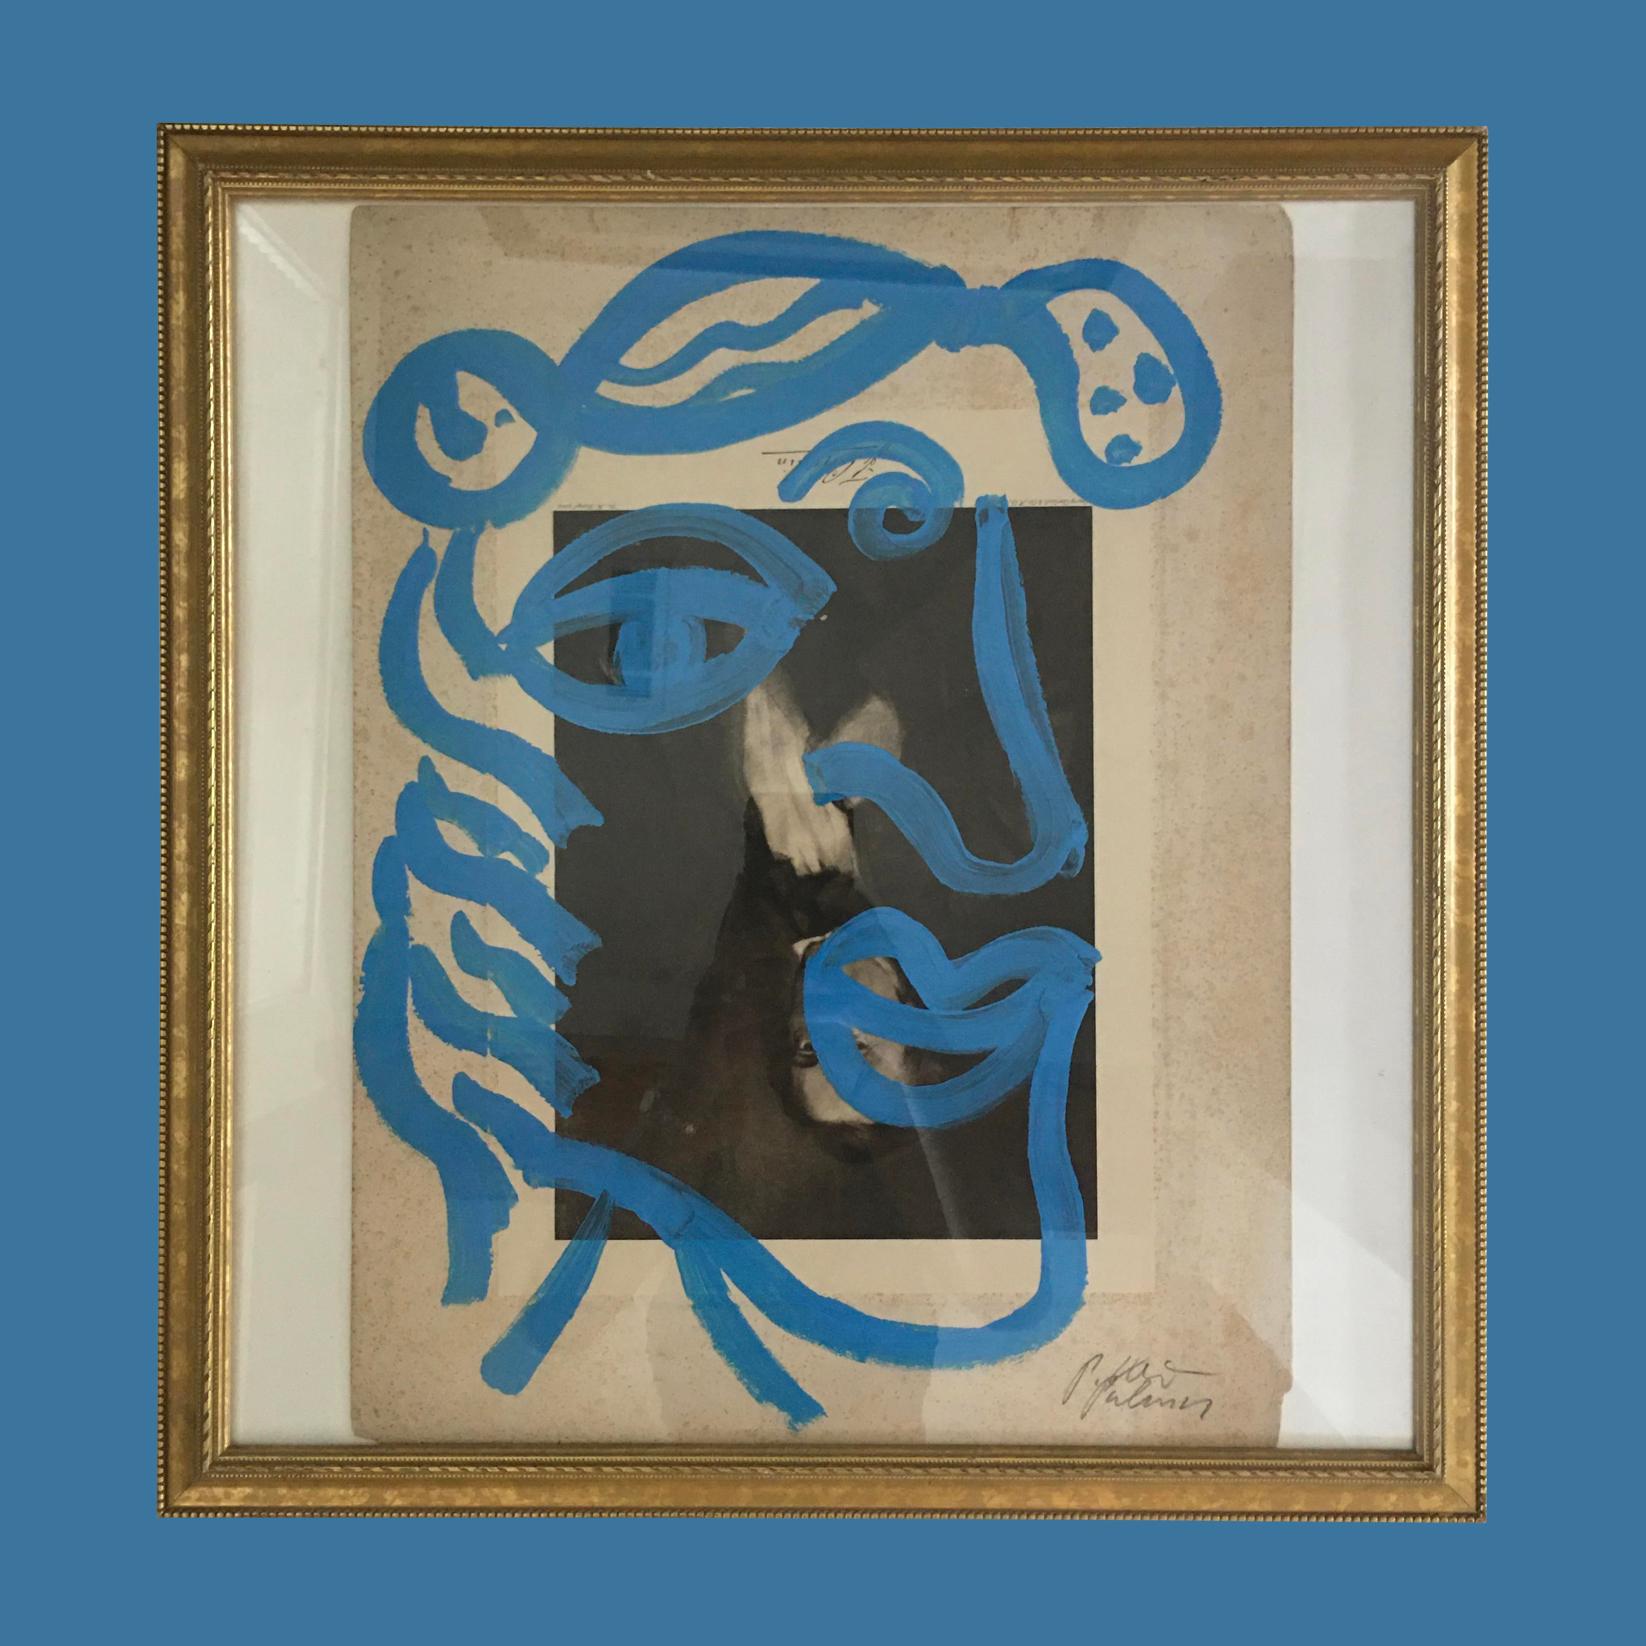 Peter Keil Untitled 1972